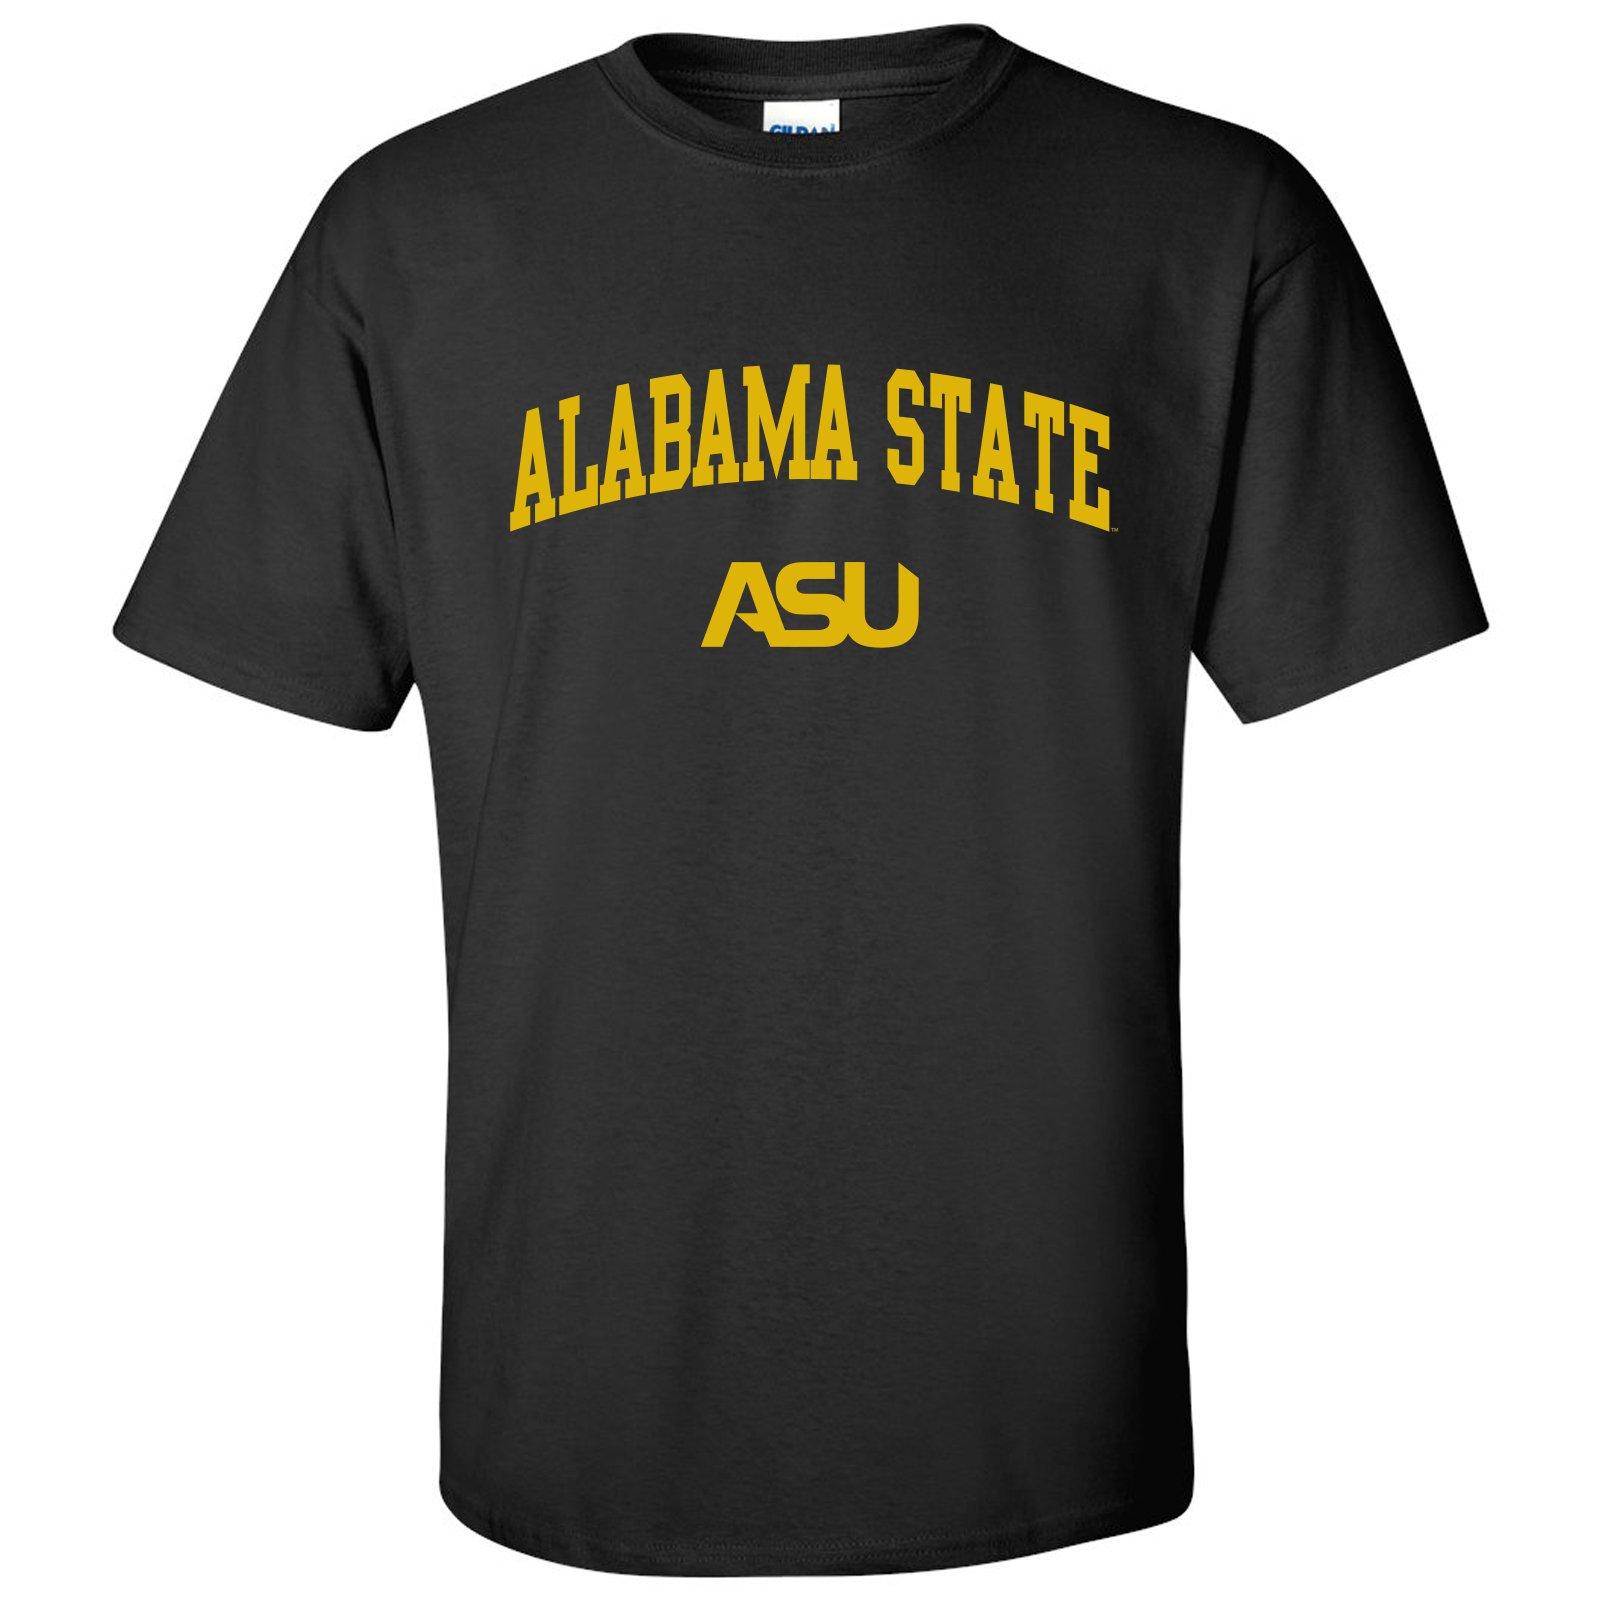 AS03 - Alabama State University Hornets Arch Logo T-Shirt - Large - Black